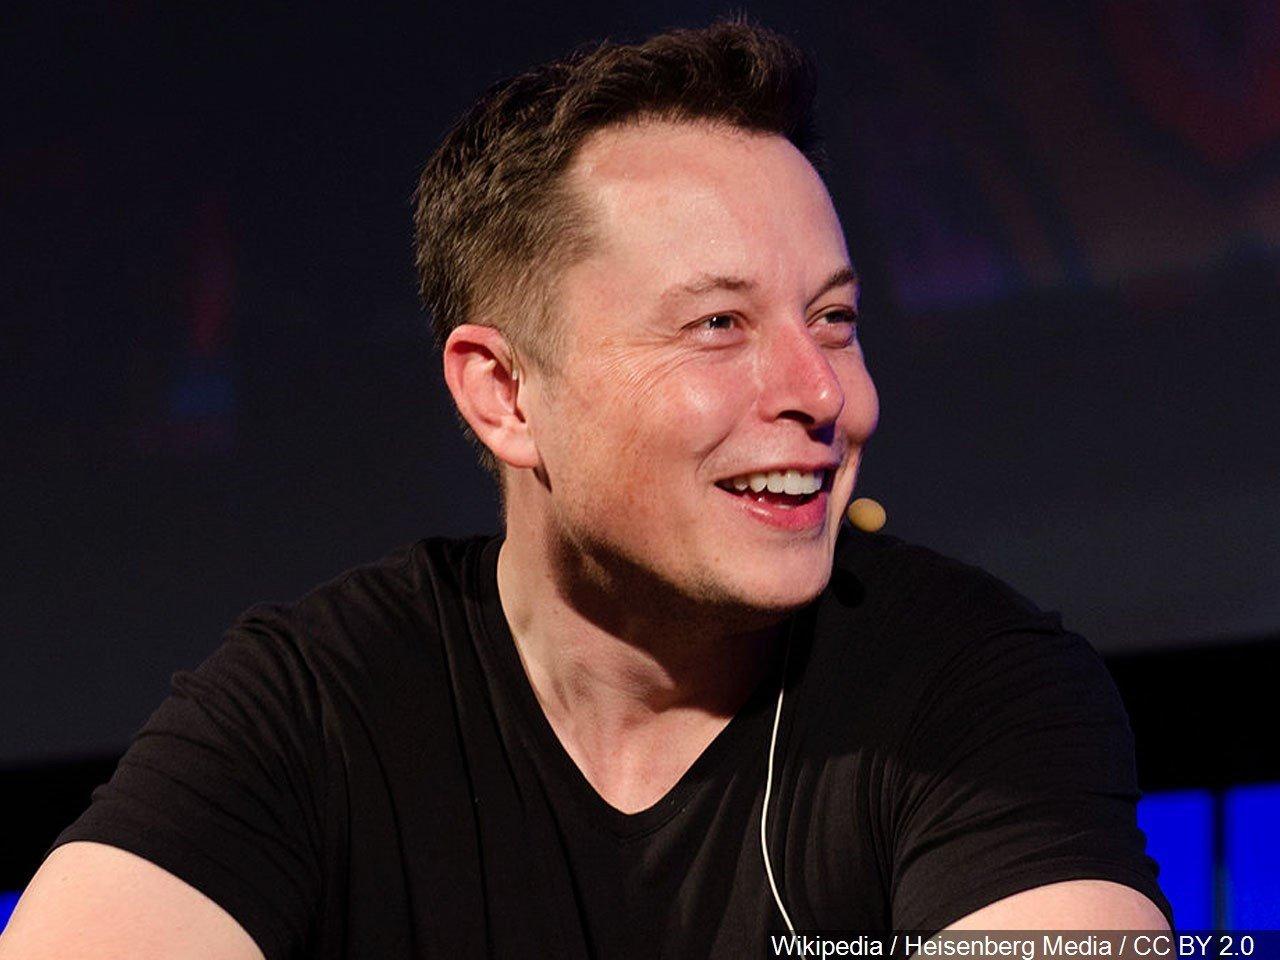 Tesla CEO Elon Musk / Courtesy: Elon Musk